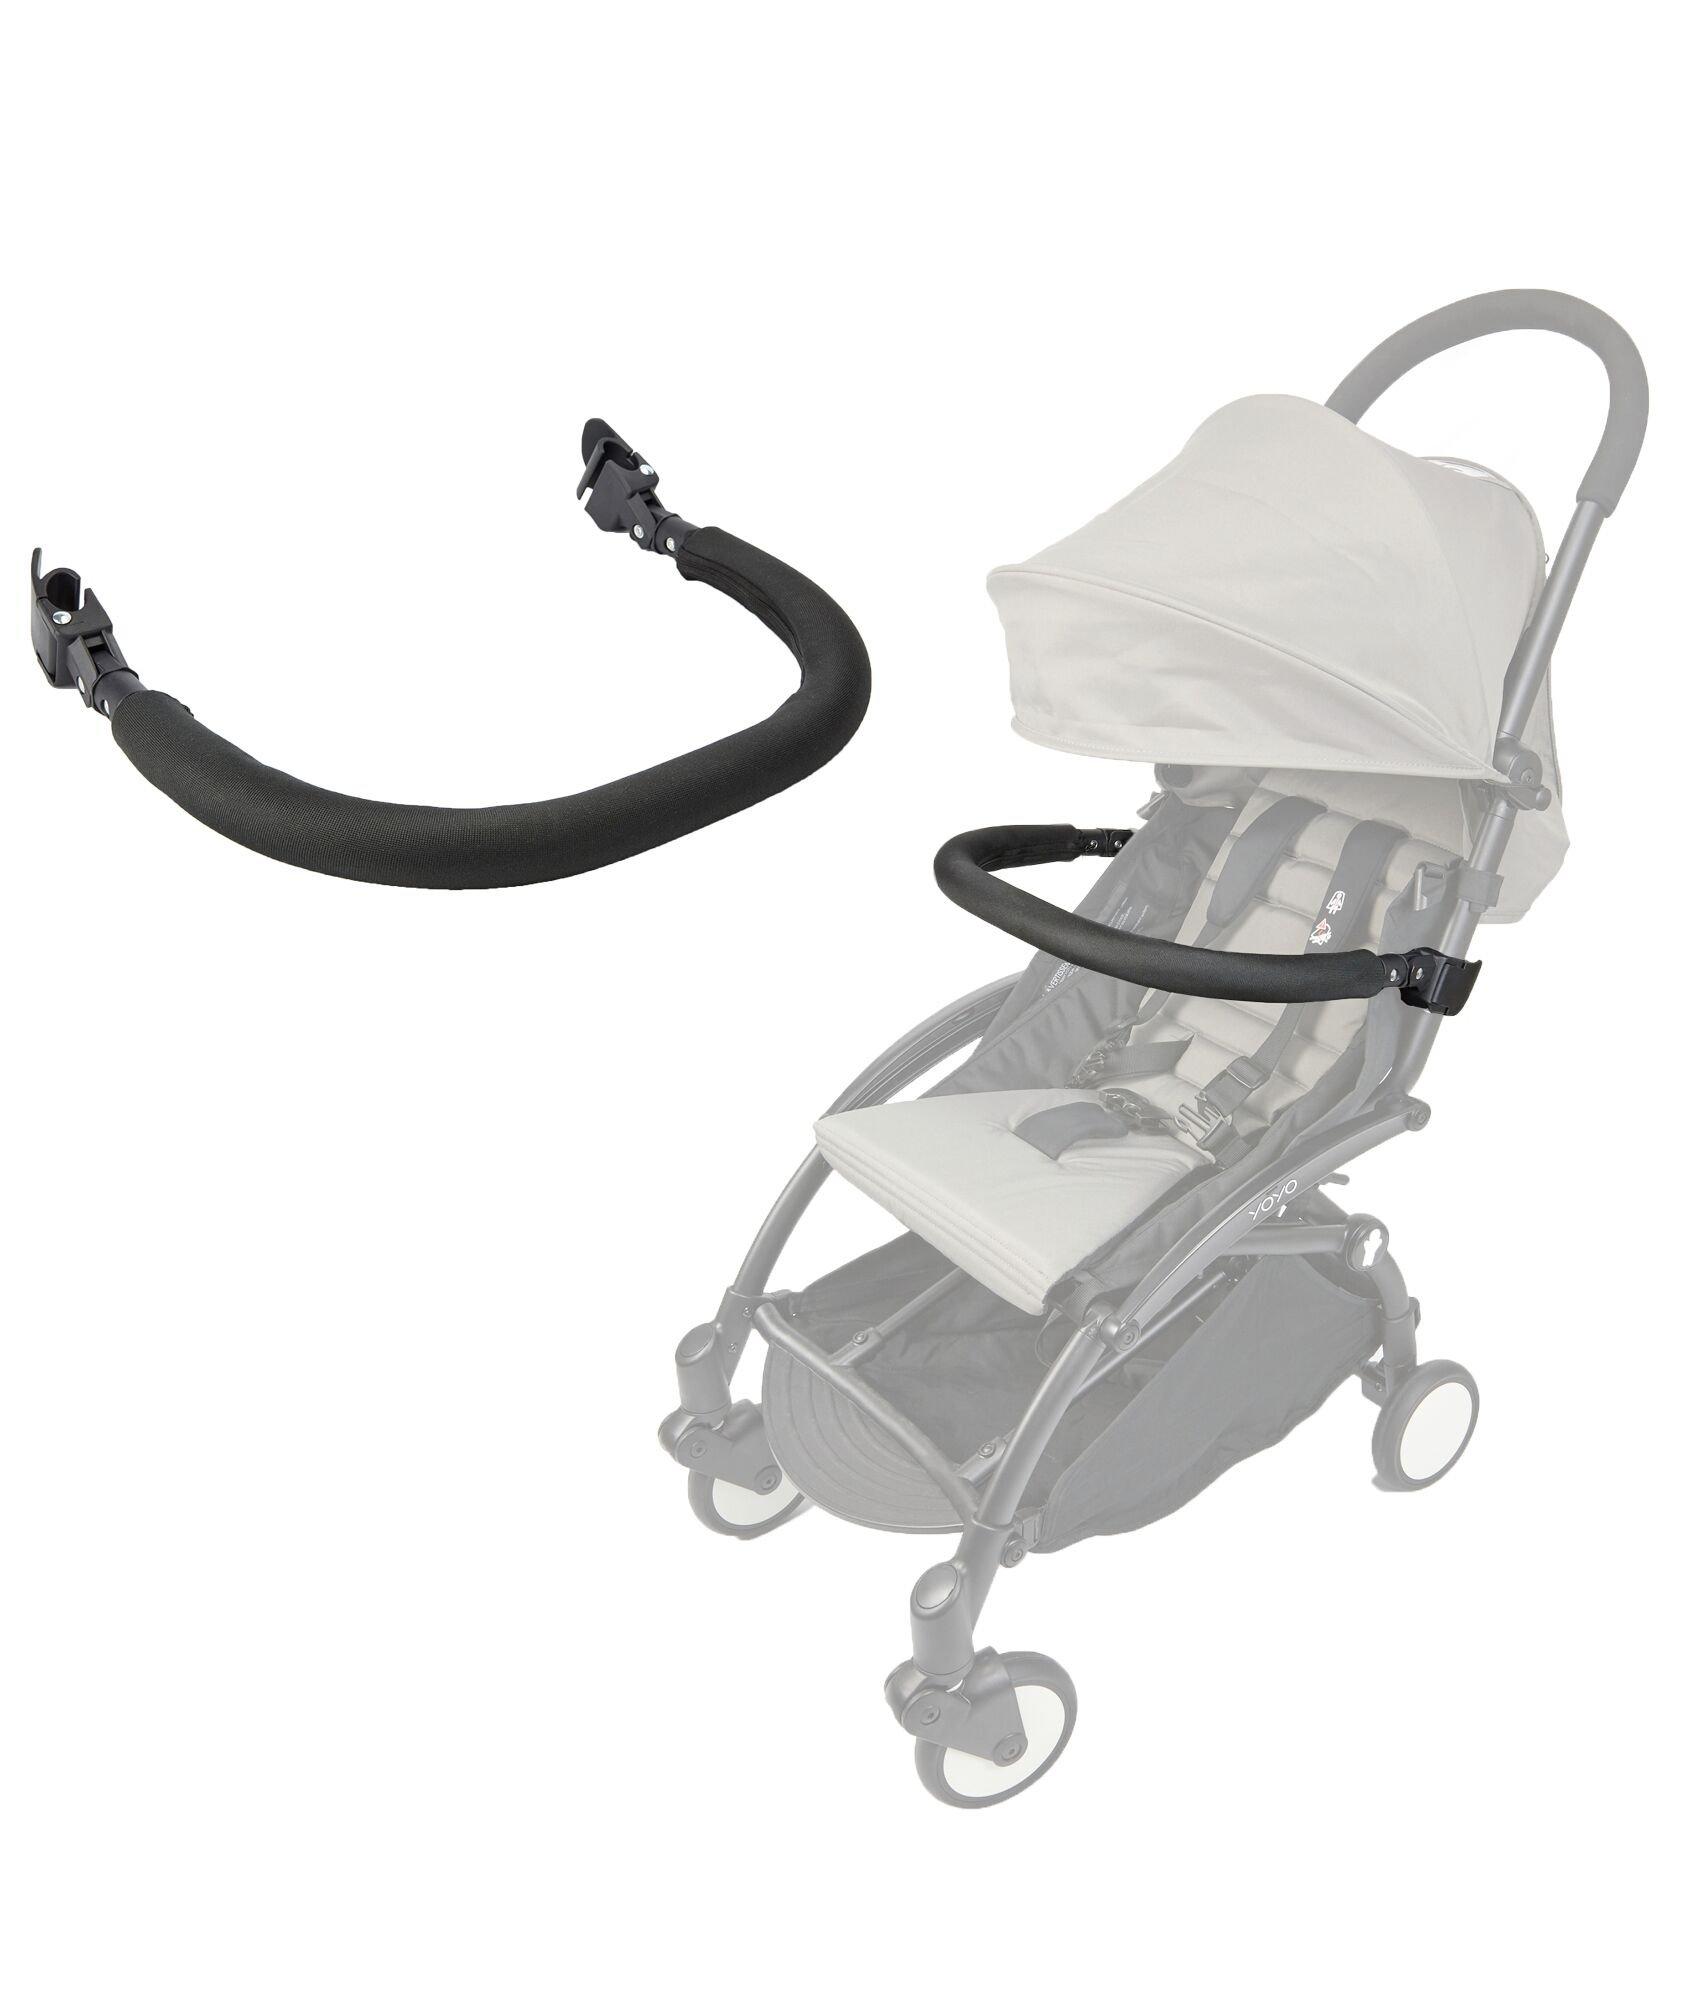 Amazon.com : BabyZen 2018 Yoyo+ Stroller Black Frame (Black) : Baby